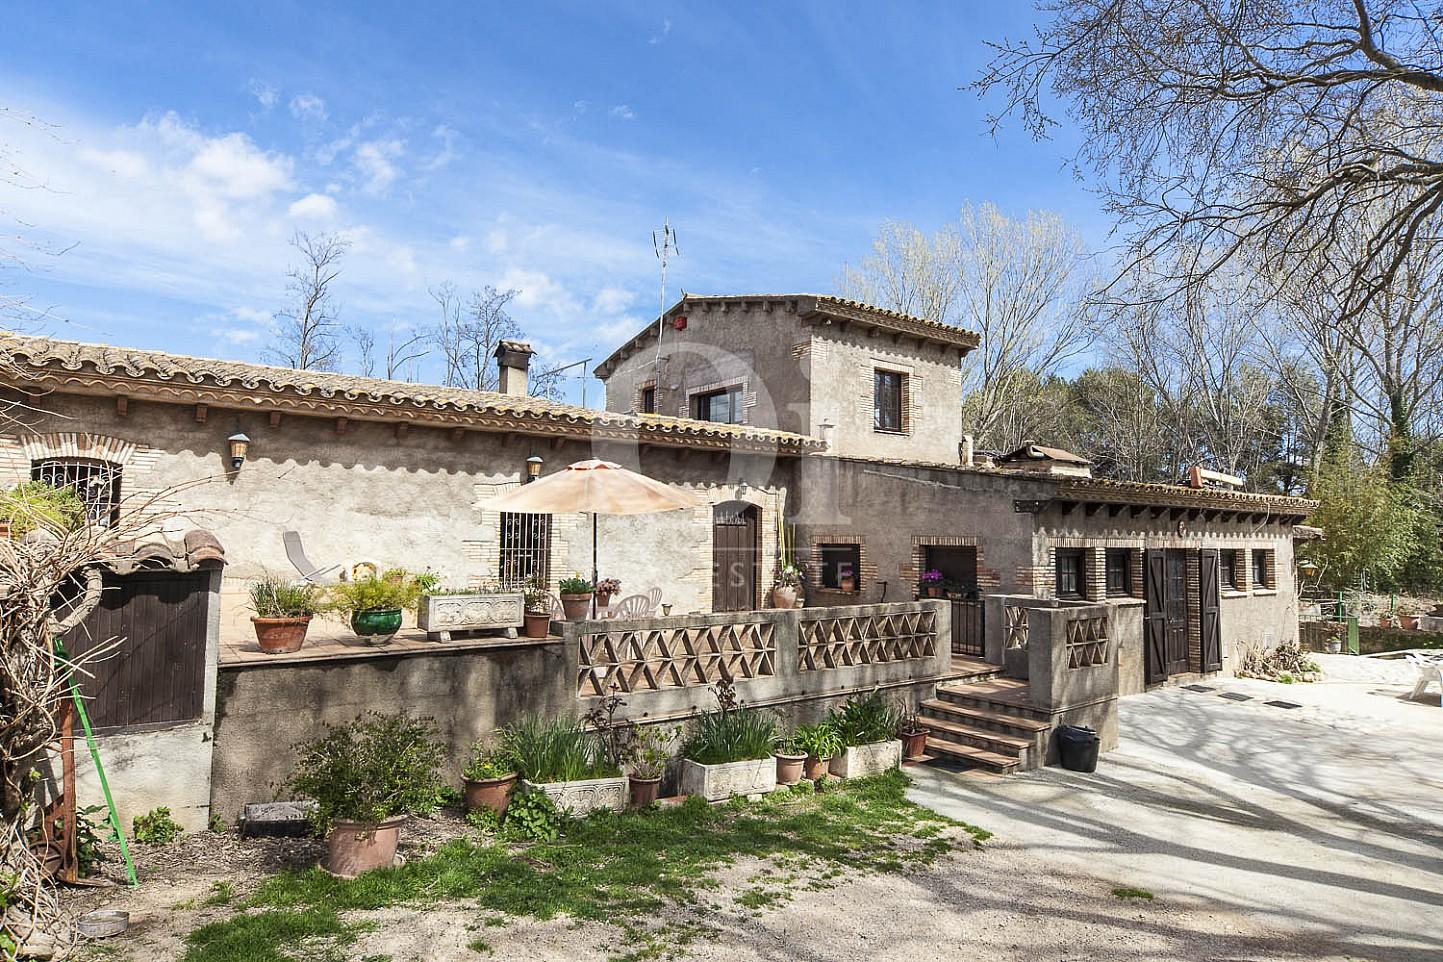 Fachada de casa en venta en Borrassà, alto Ampurdán, Gerona